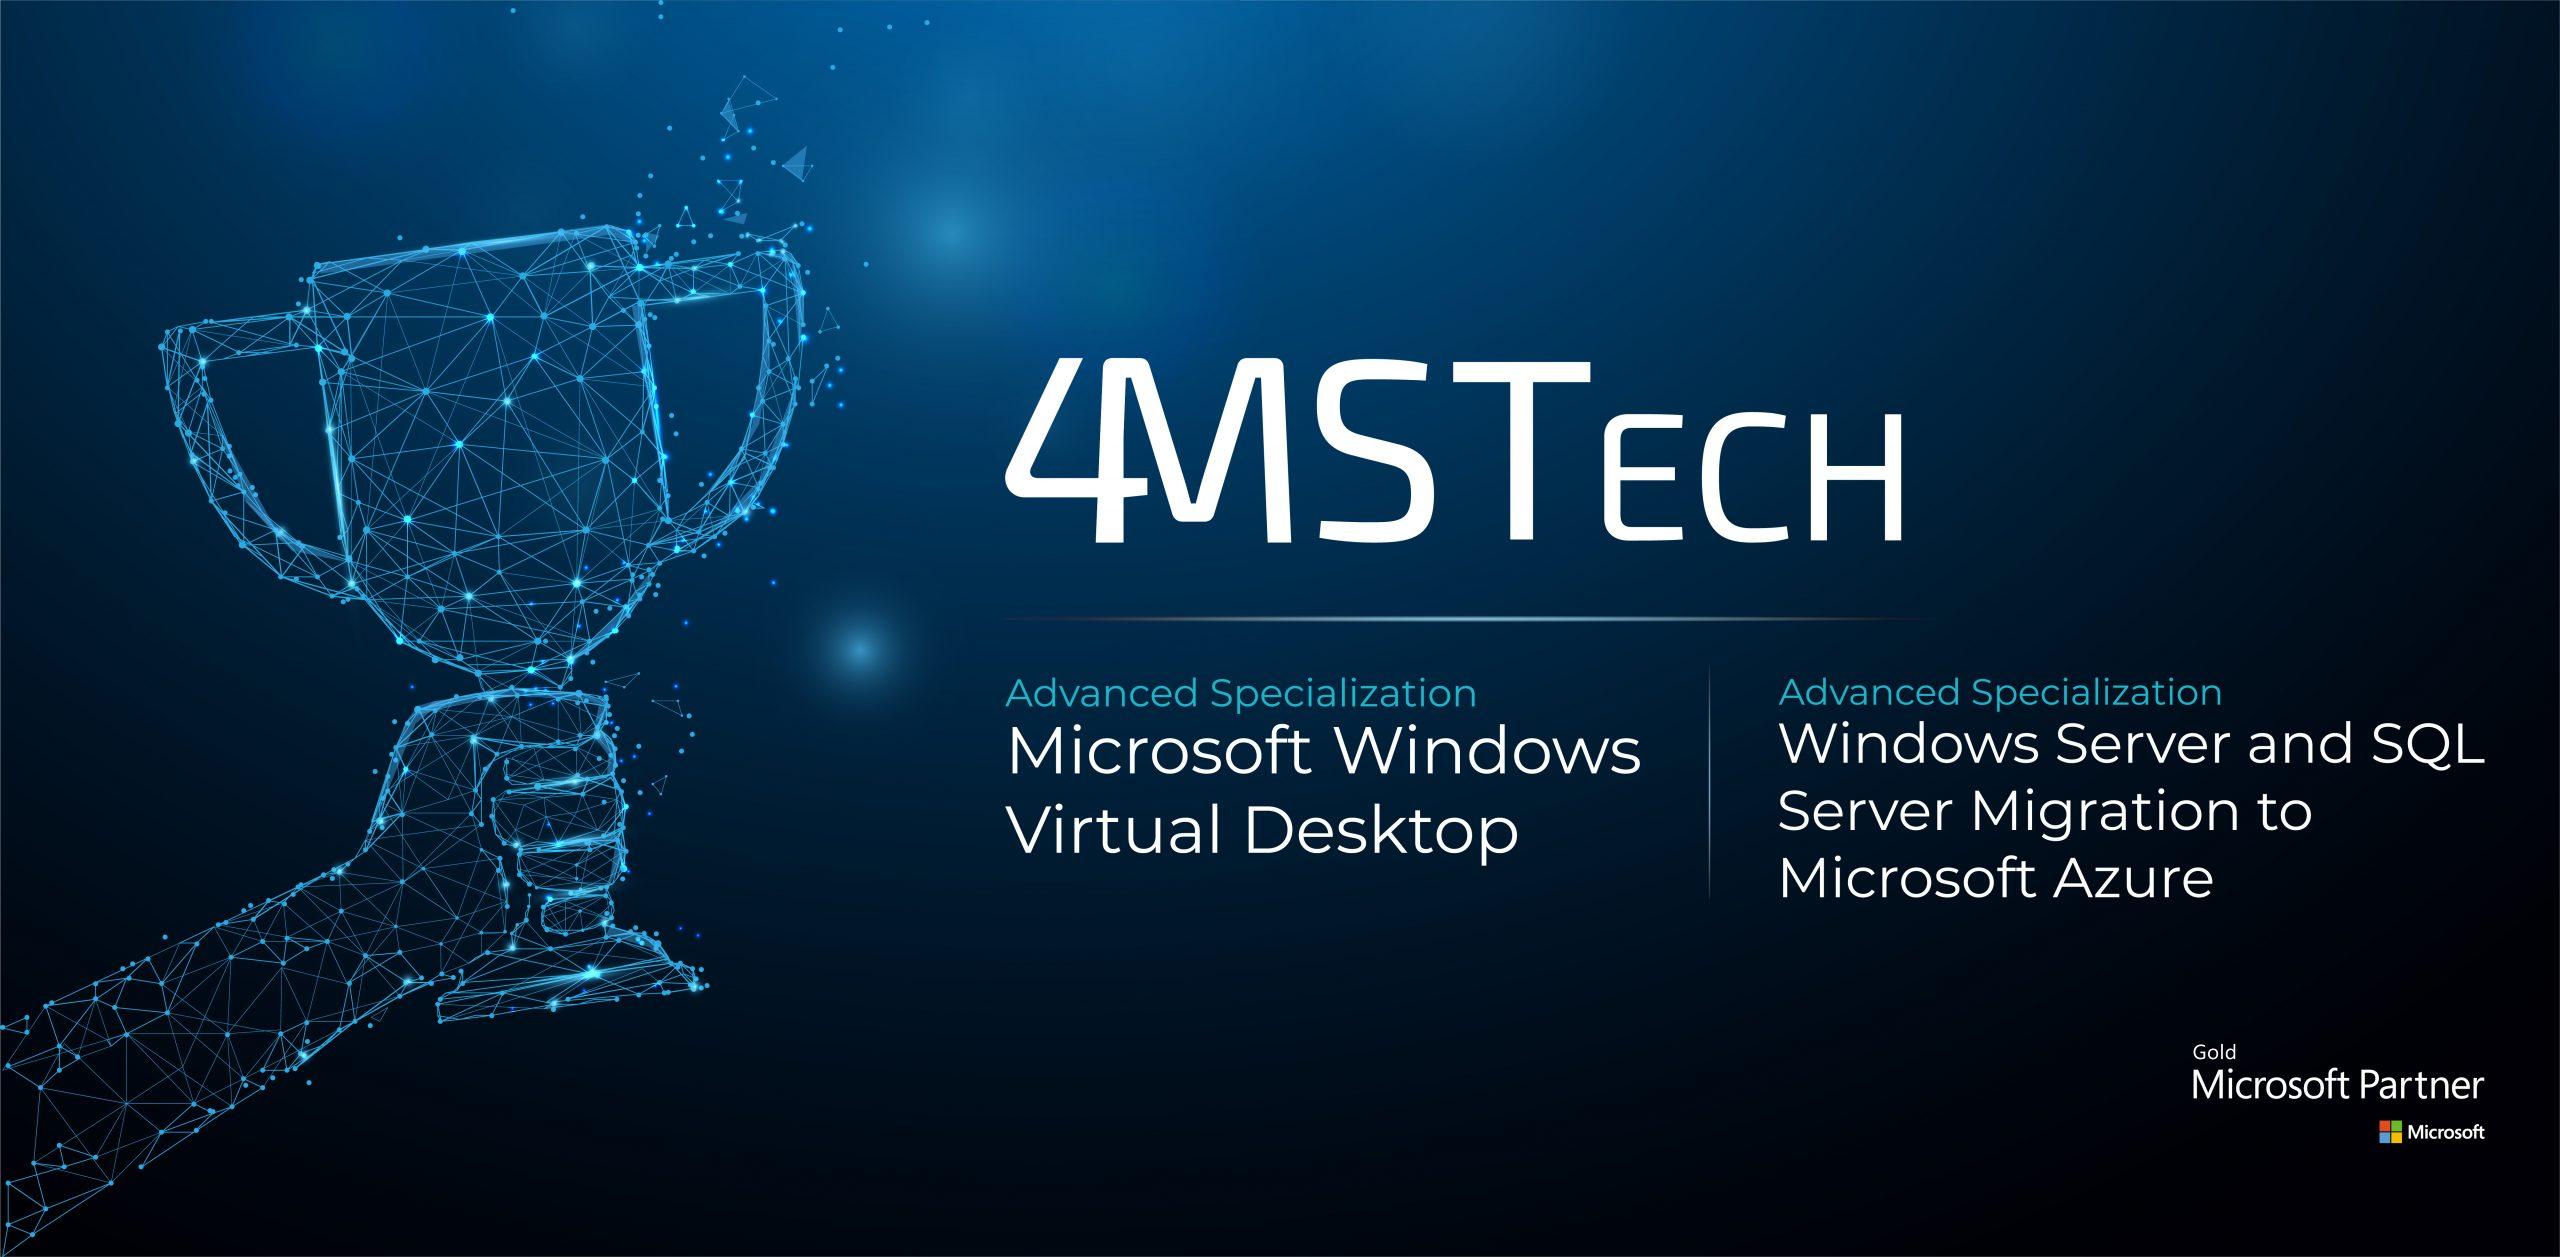 Microsoft Advanced Specialization